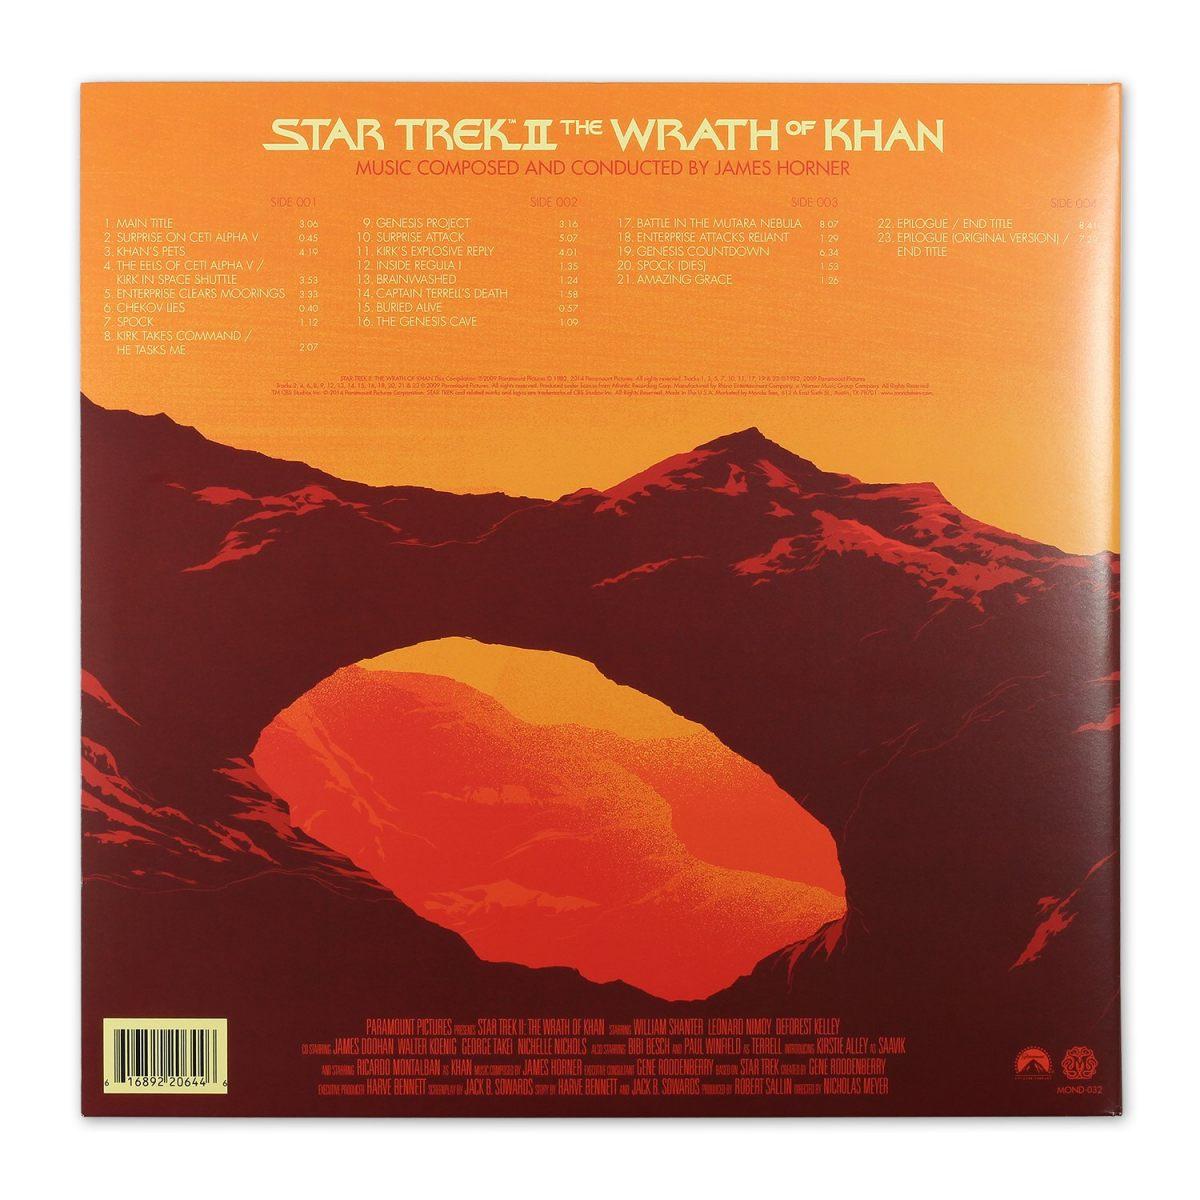 Mondo Presents The Star Trek Ii The Wrath Of Khan Score